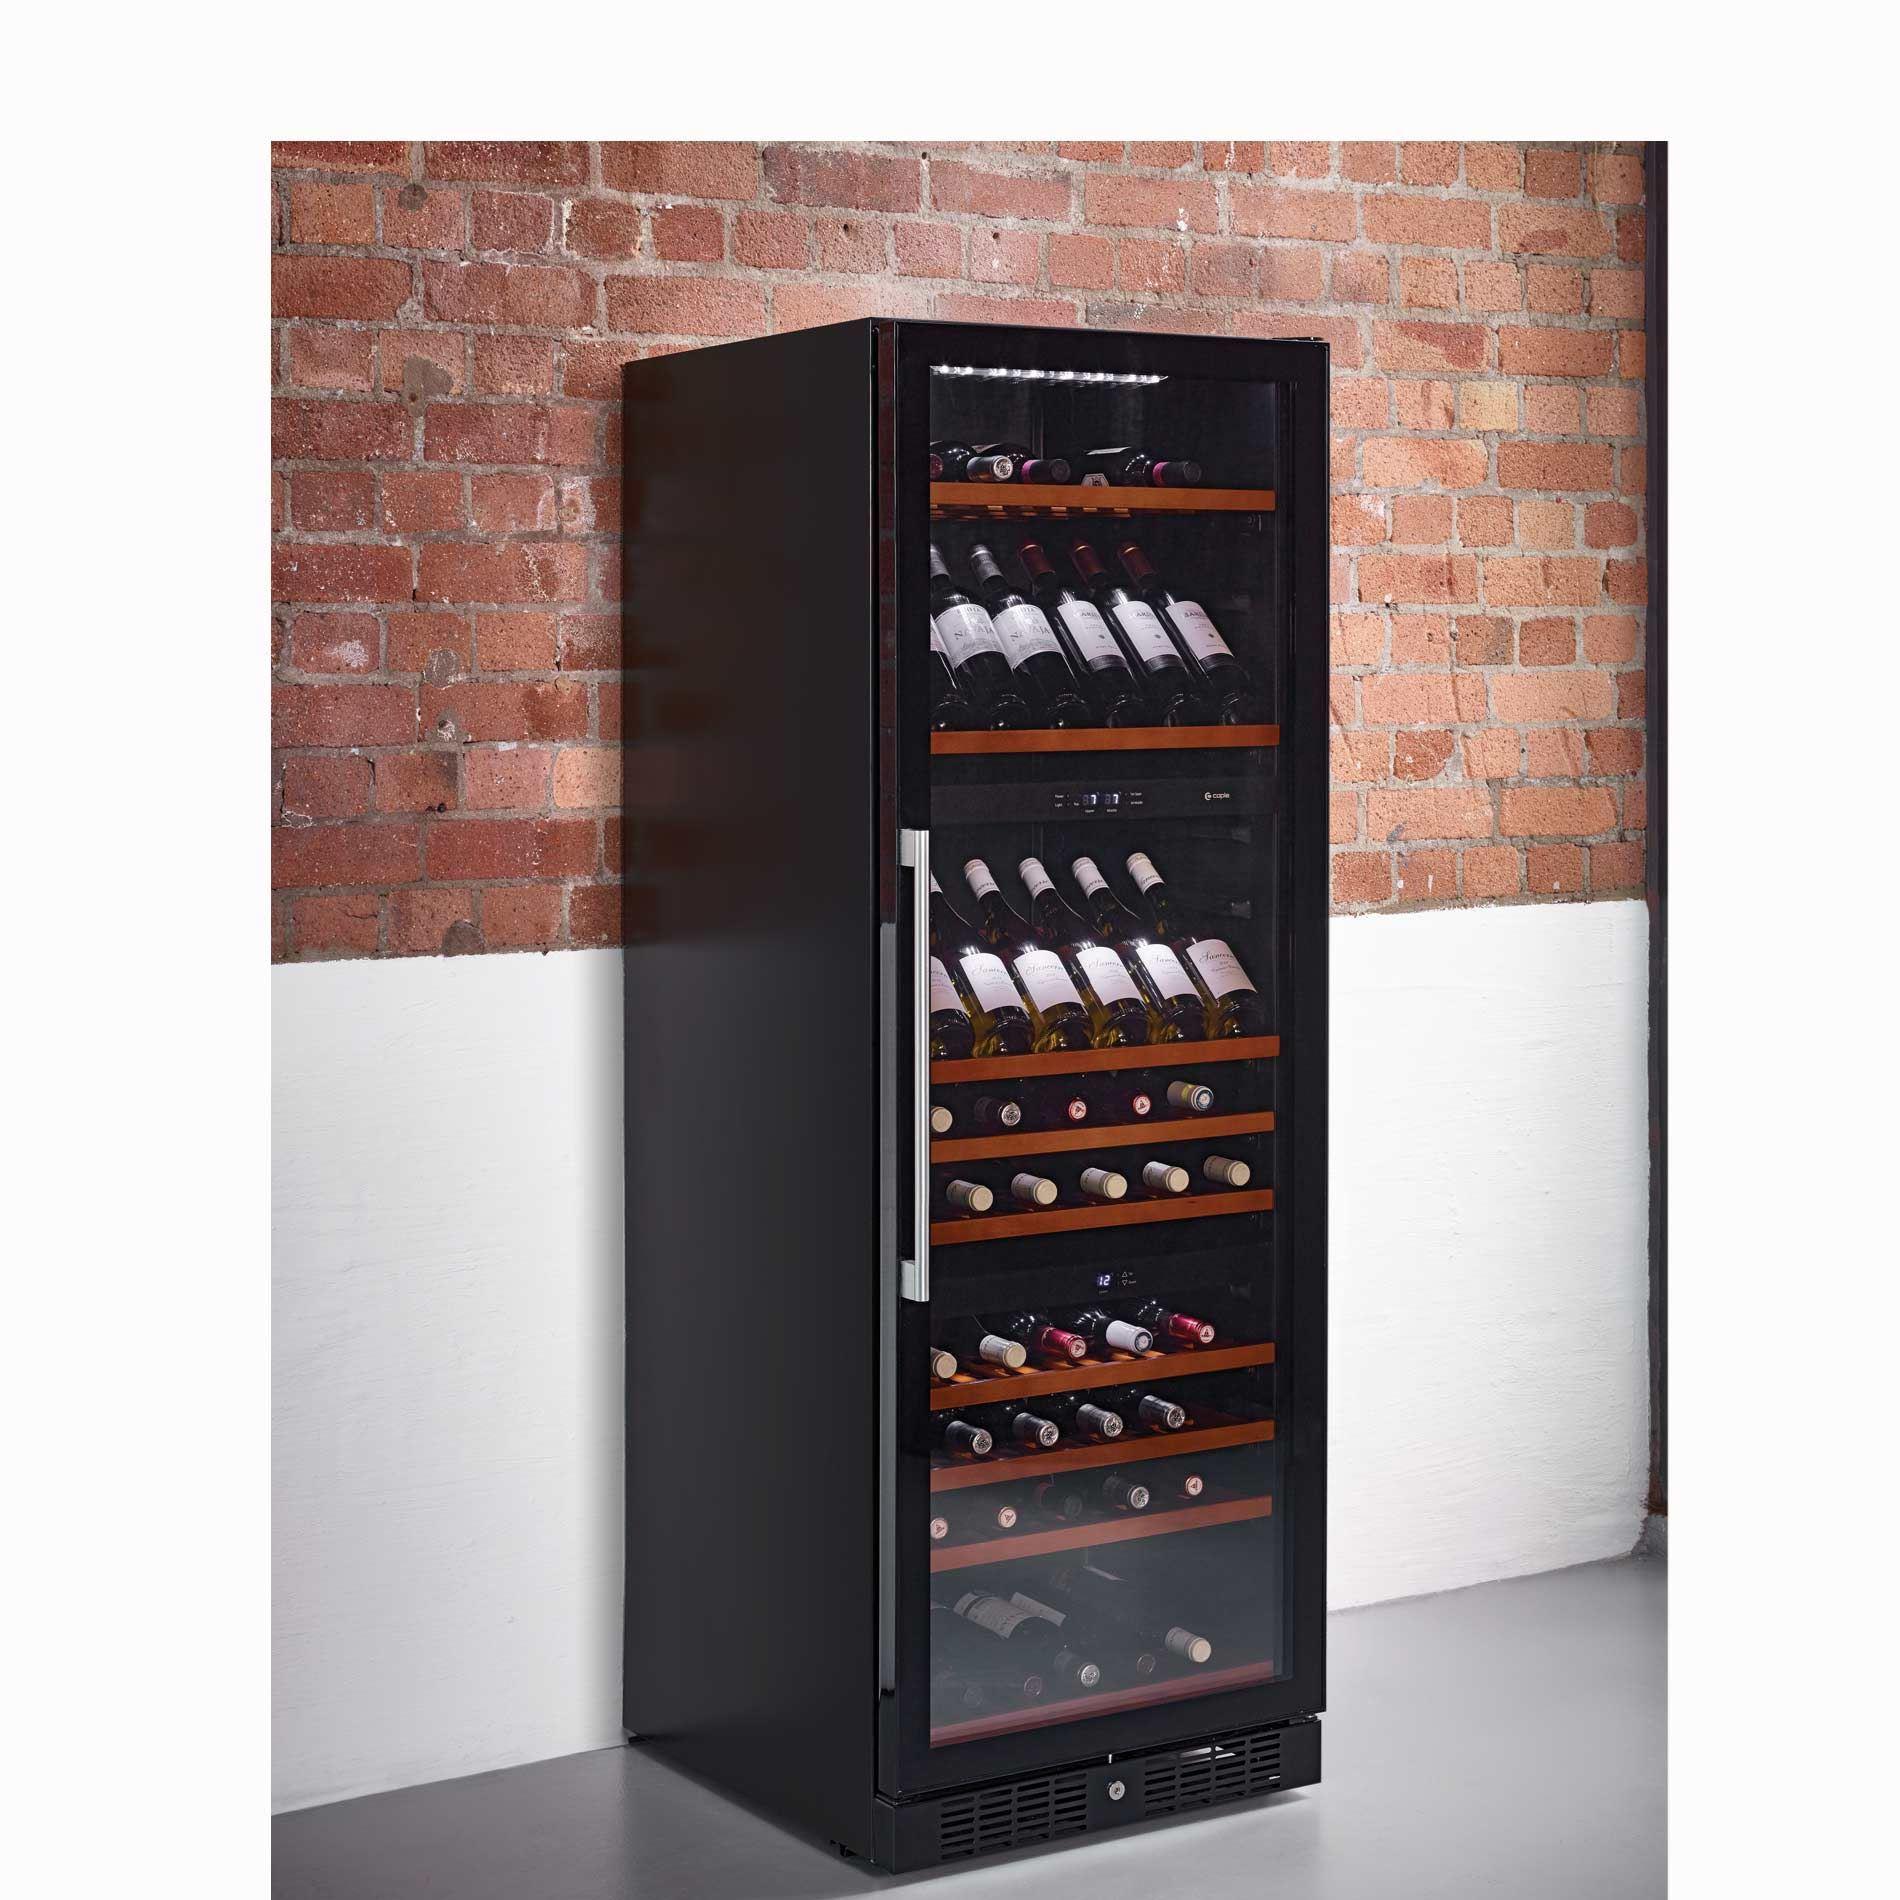 Picture of WF1549 Sense Freestanding Wine Cabinet  sc 1 st  Appliance Source & Caple: WF1549 Sense Freestanding Wine Cabinet - Appliance Source